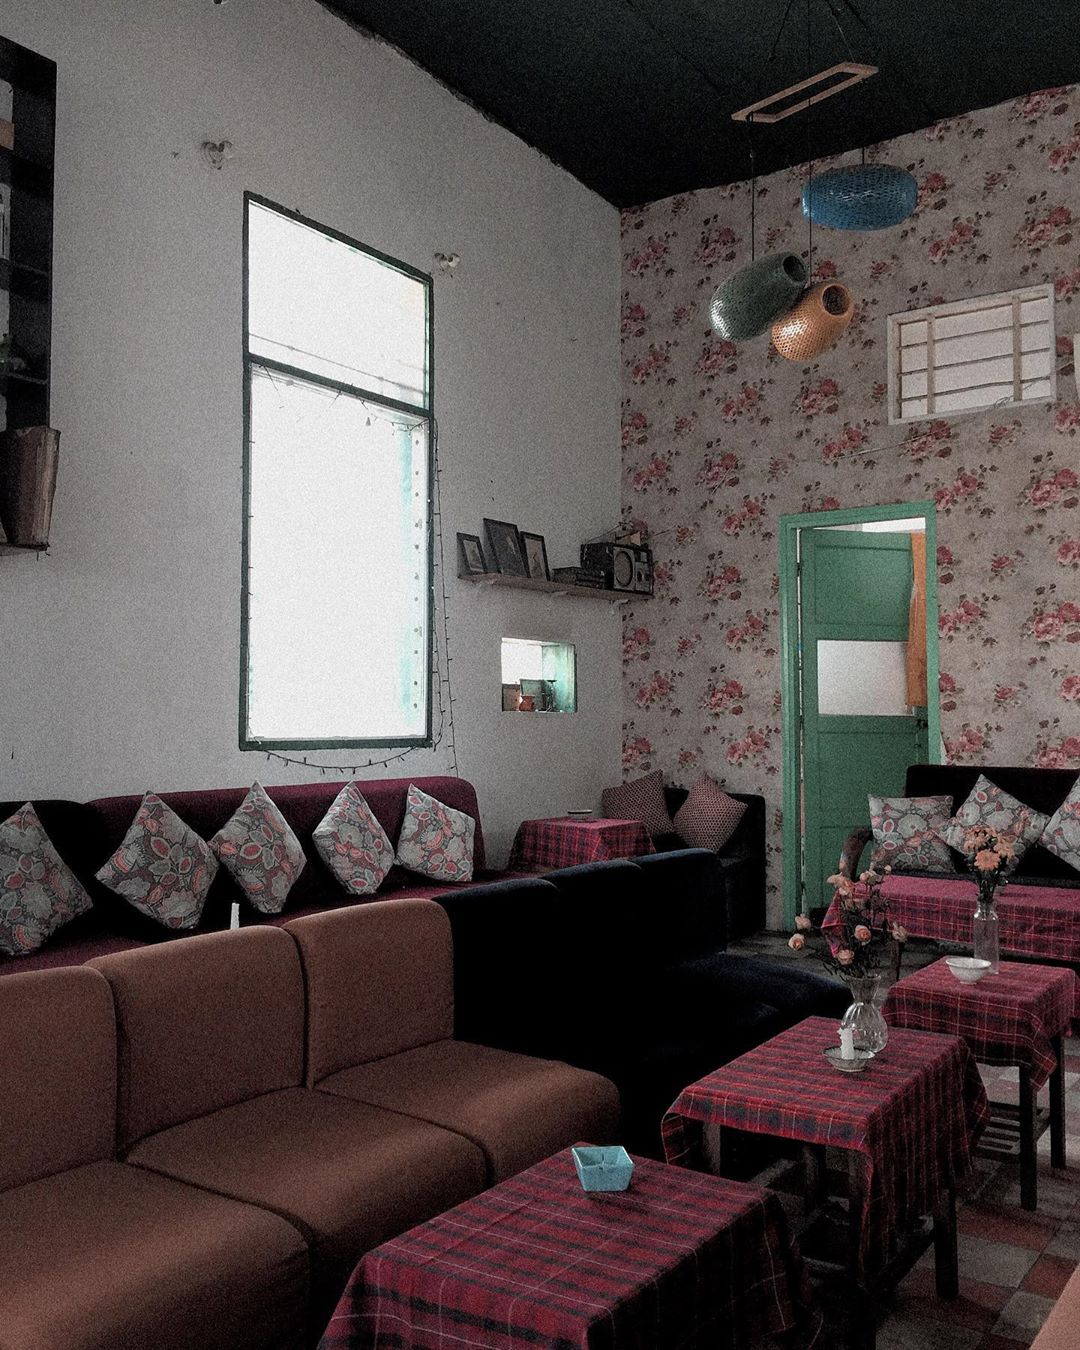 Top 7 Best Retro Style Café in Saigon 7